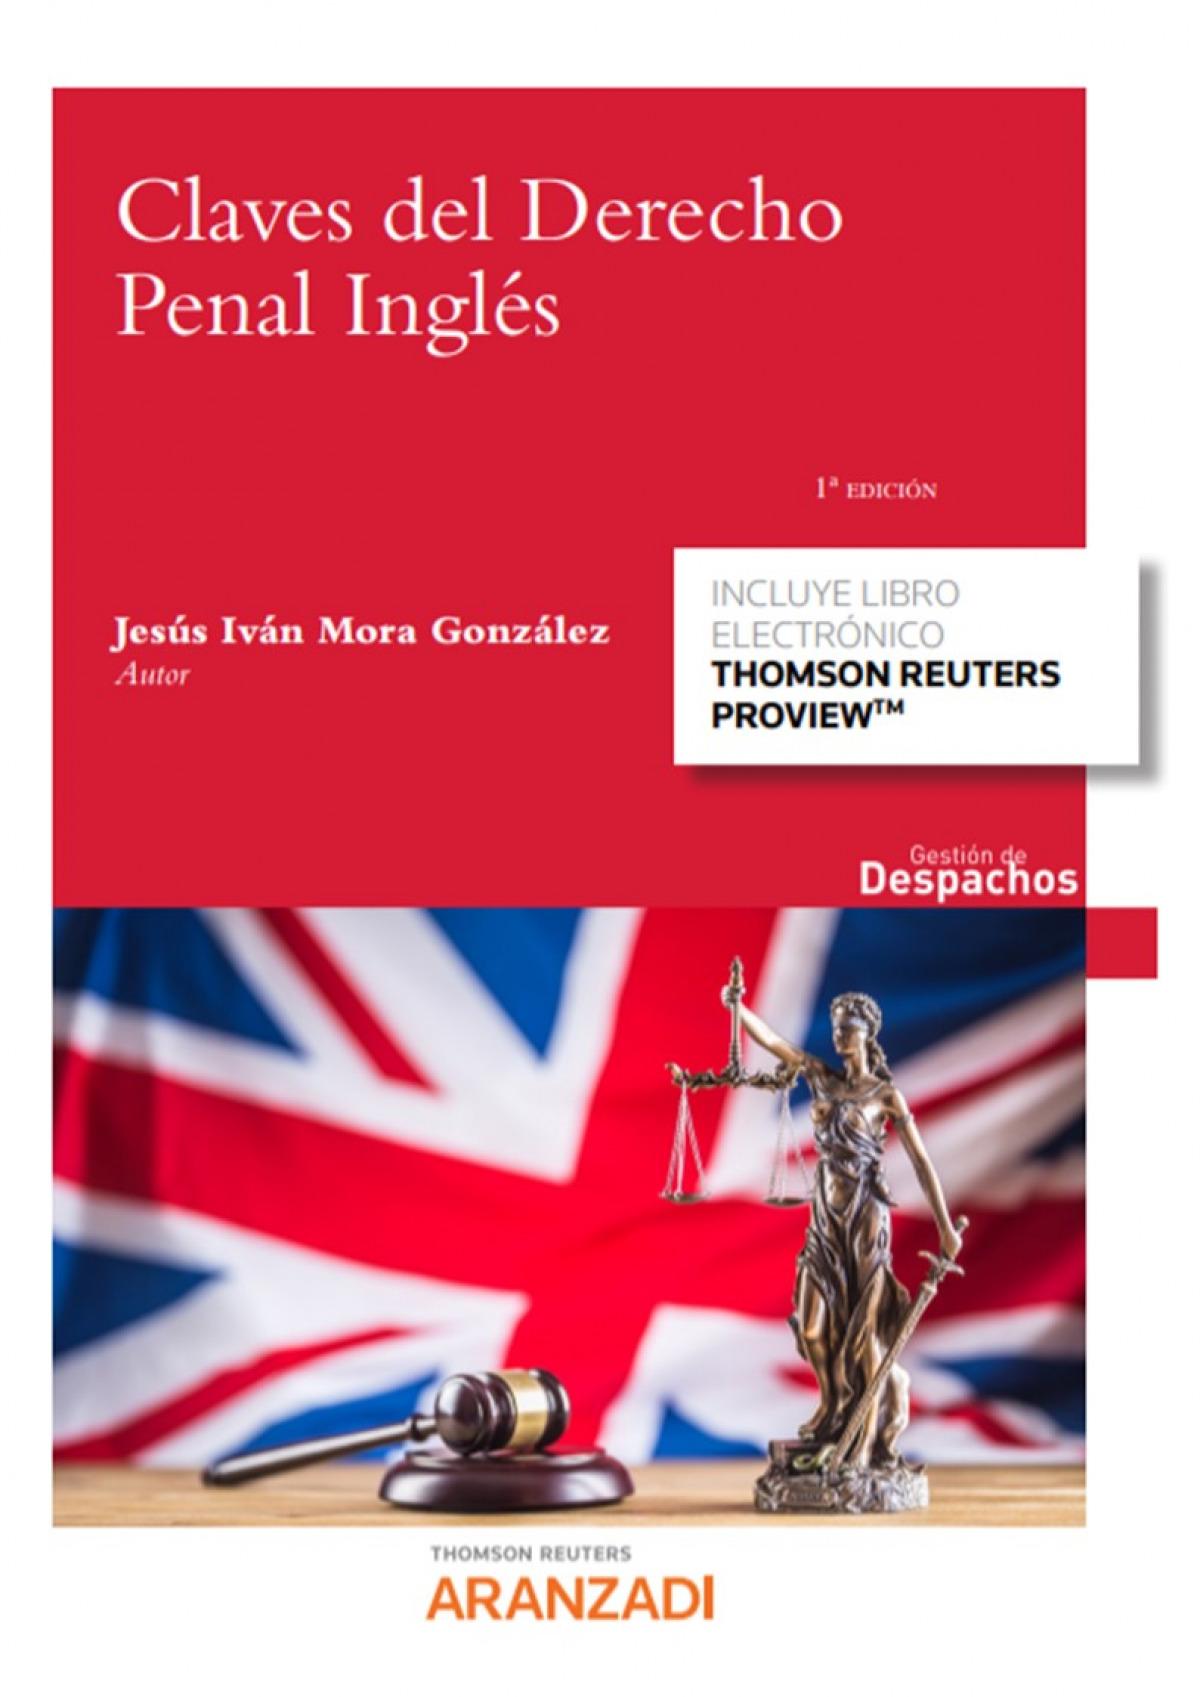 Claves del Derecho Penal Inglés (Papel + e-book)